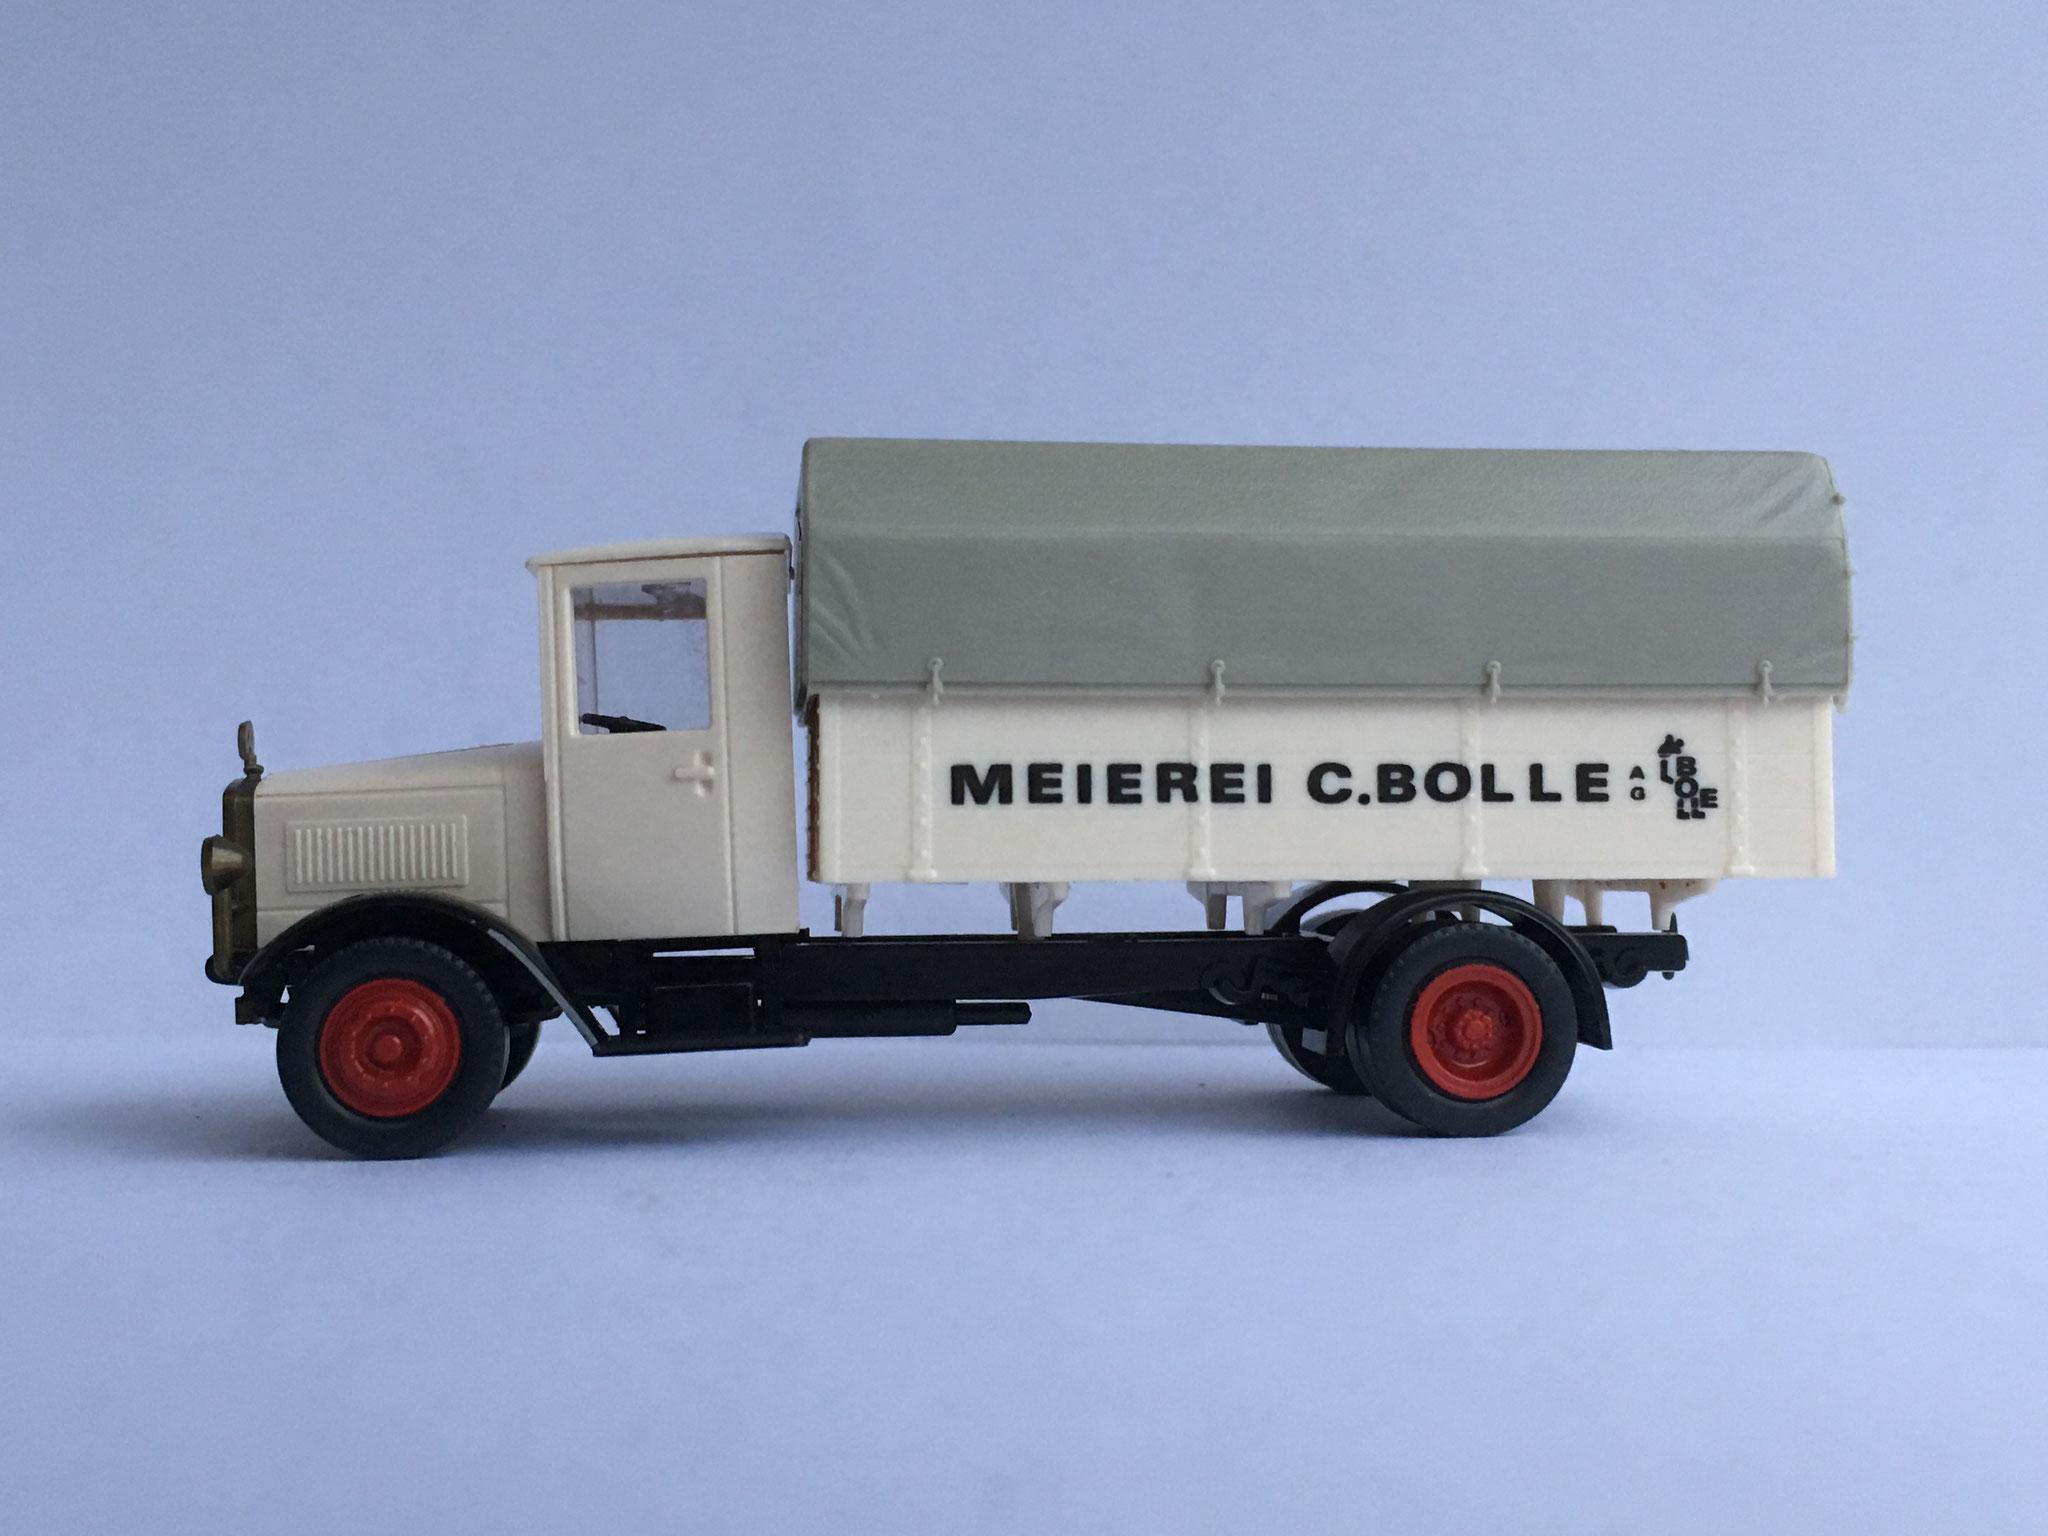 Mercedes L5 Meierei C. Bolle, Art. Nr. R1 (Pietsch), 1989